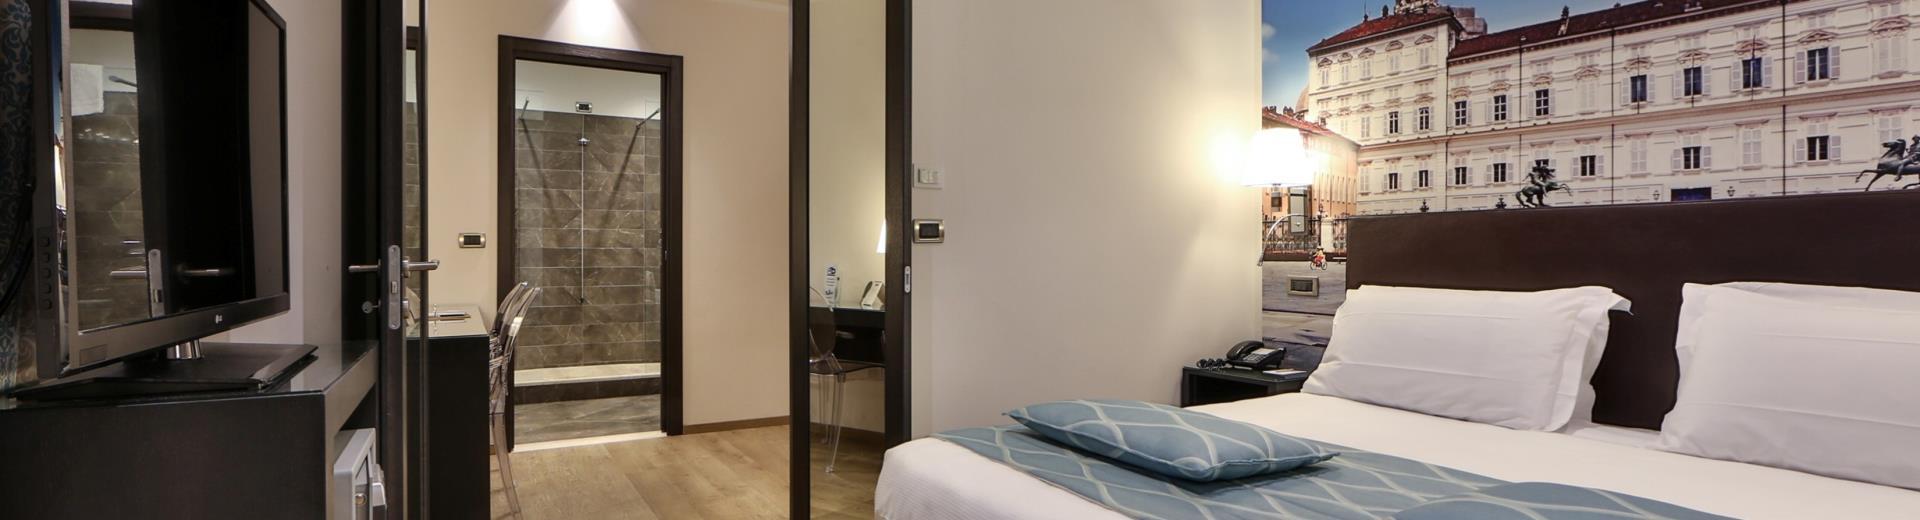 Best Western Hotel Genova Torino Spa